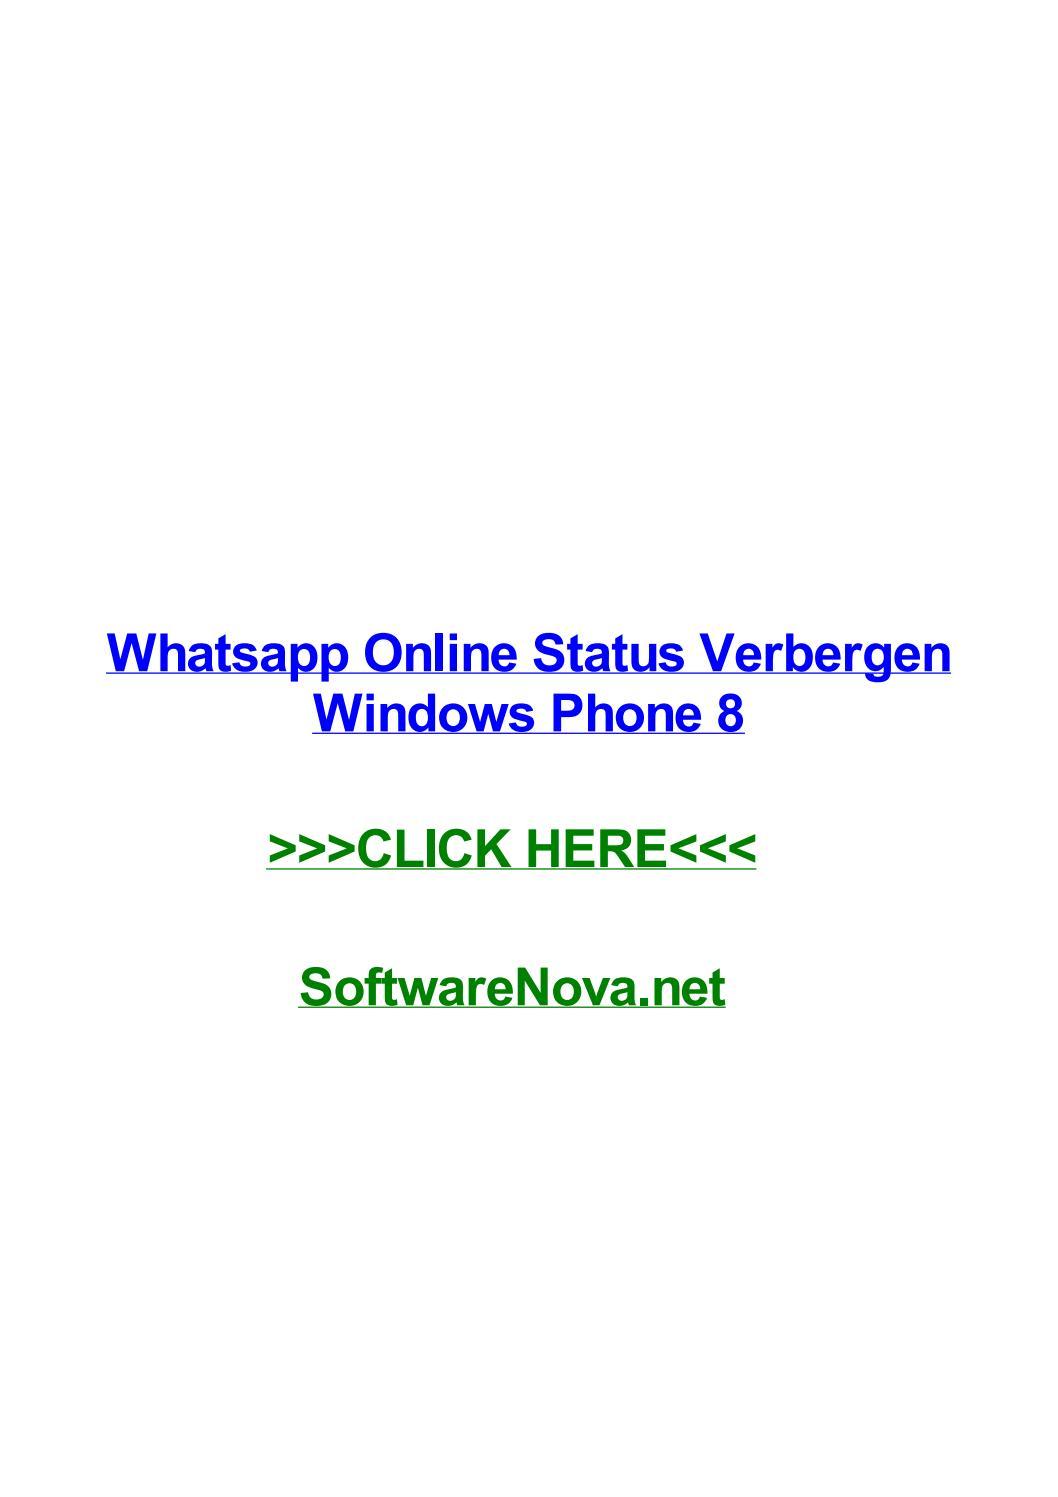 Whatsapp Online Status Verbergen Windows Phone 8 By